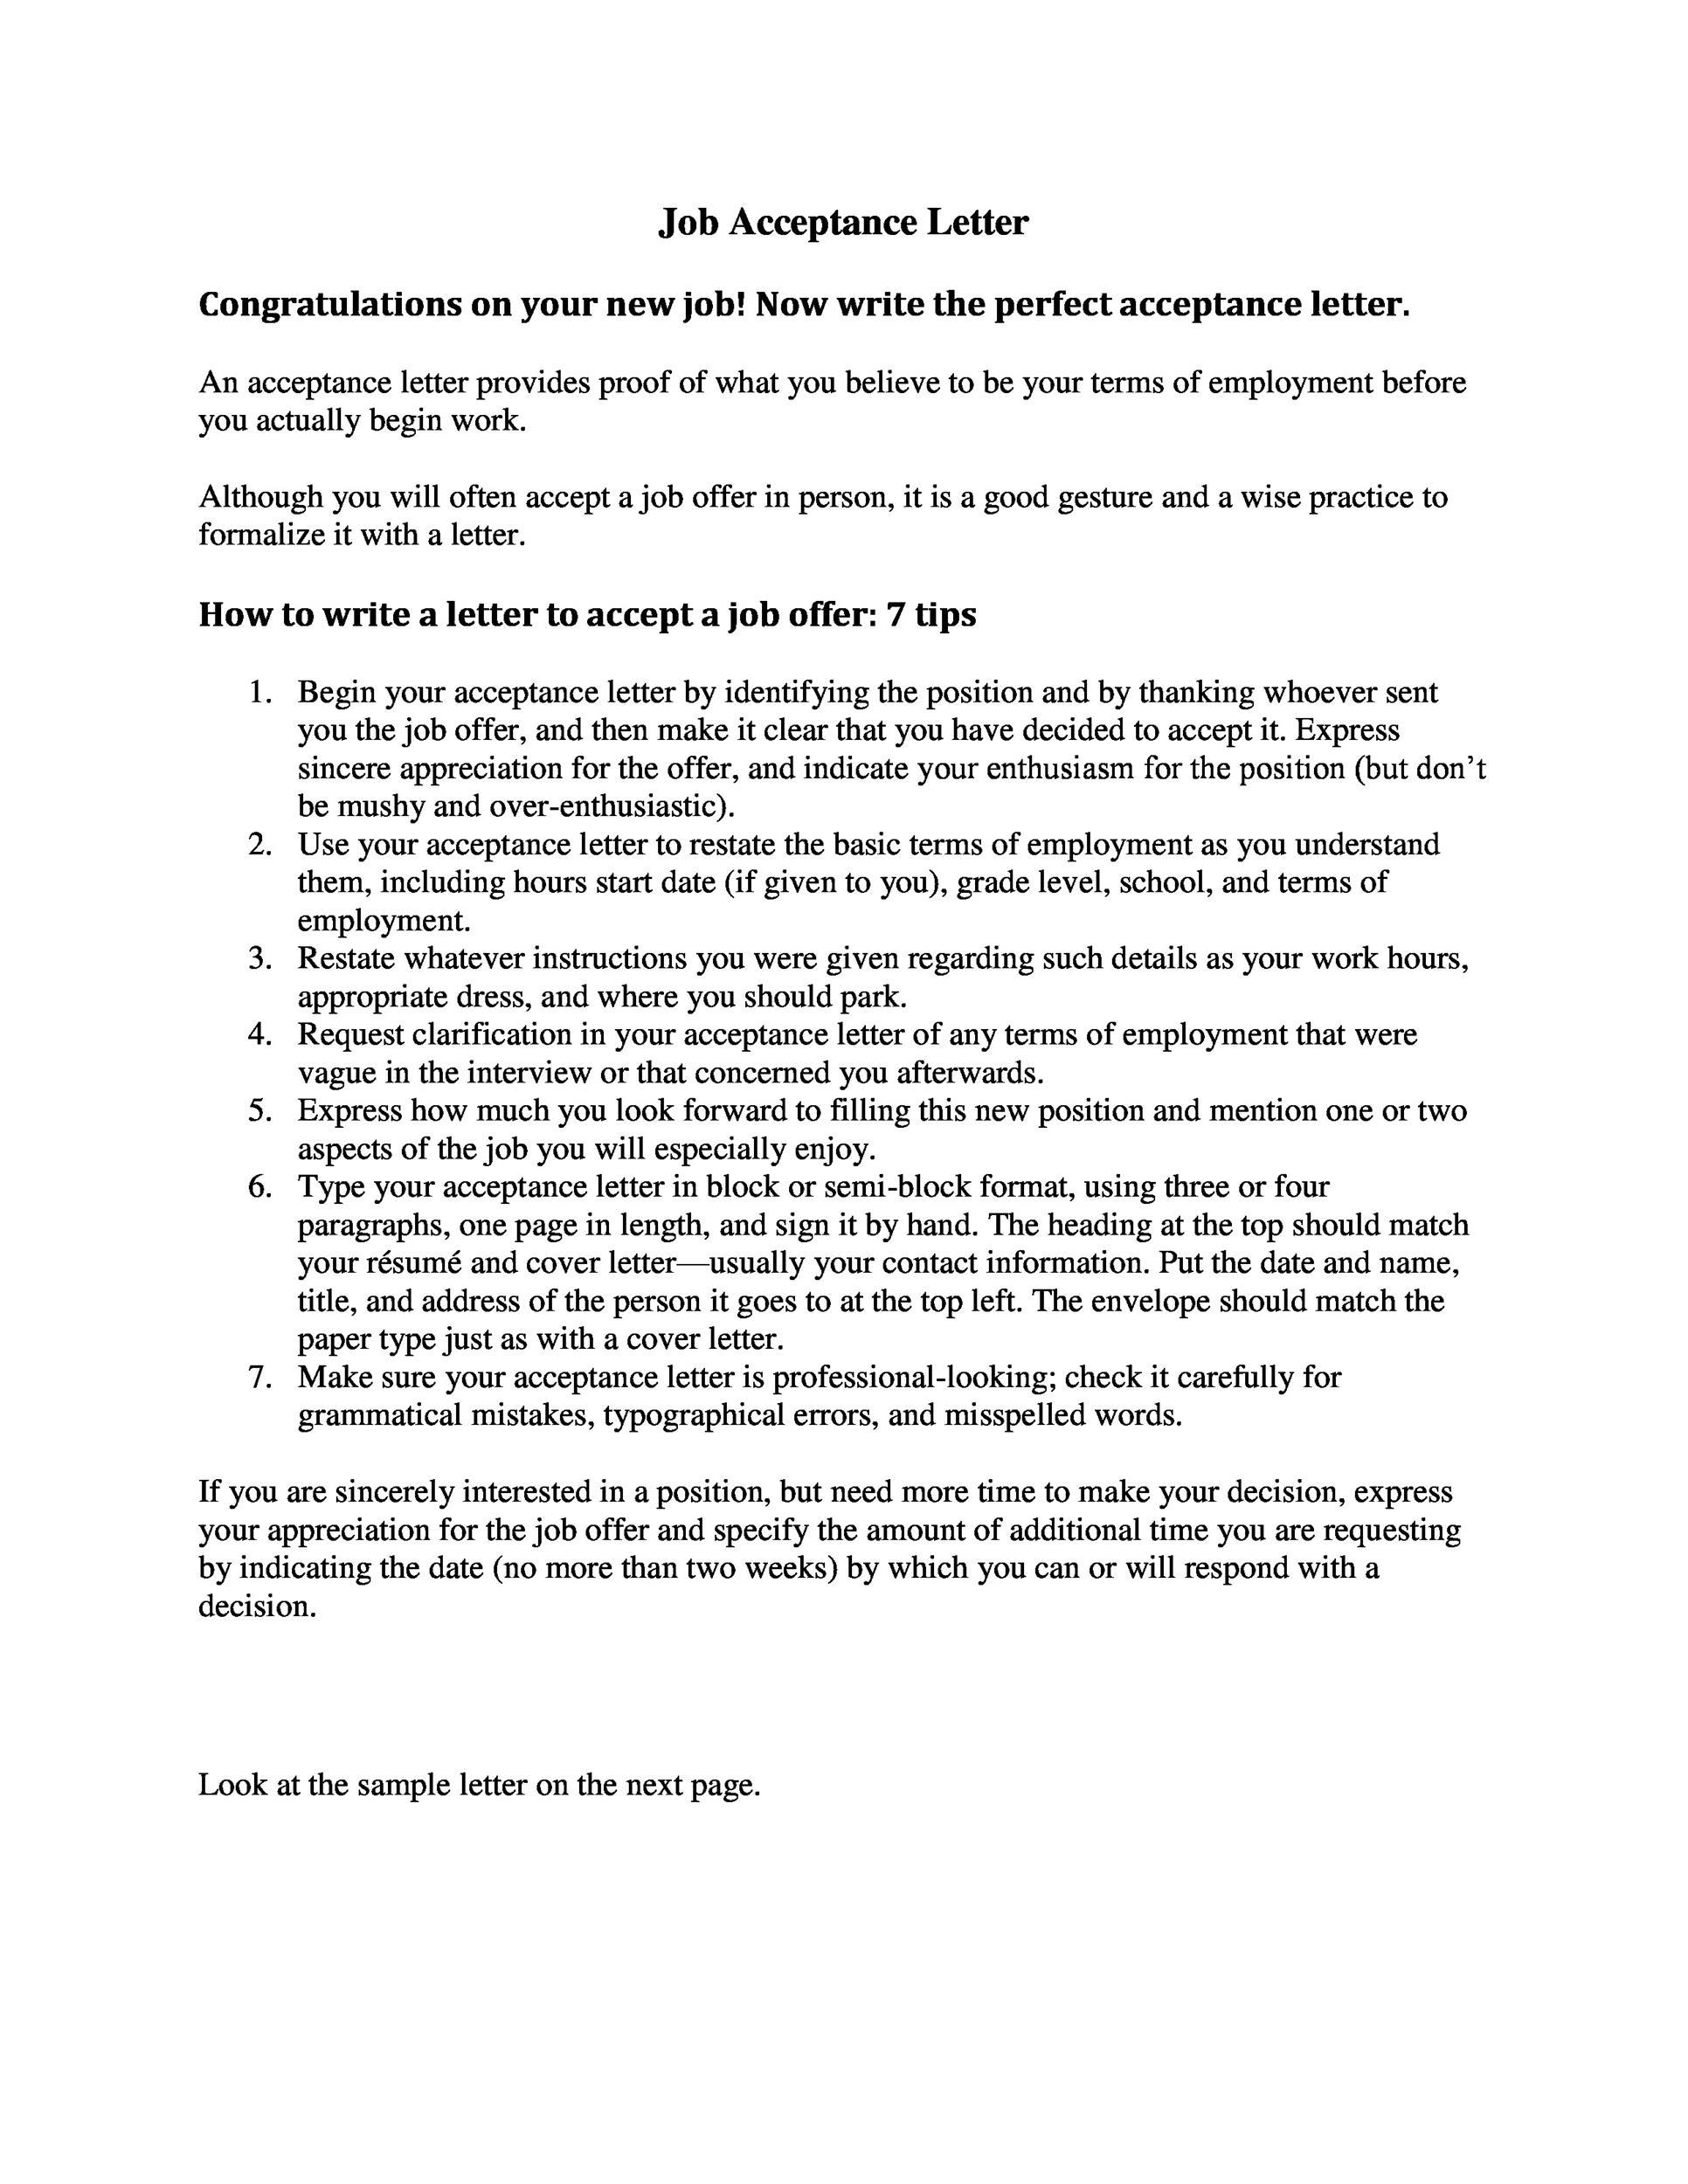 Free job acceptance letter 12